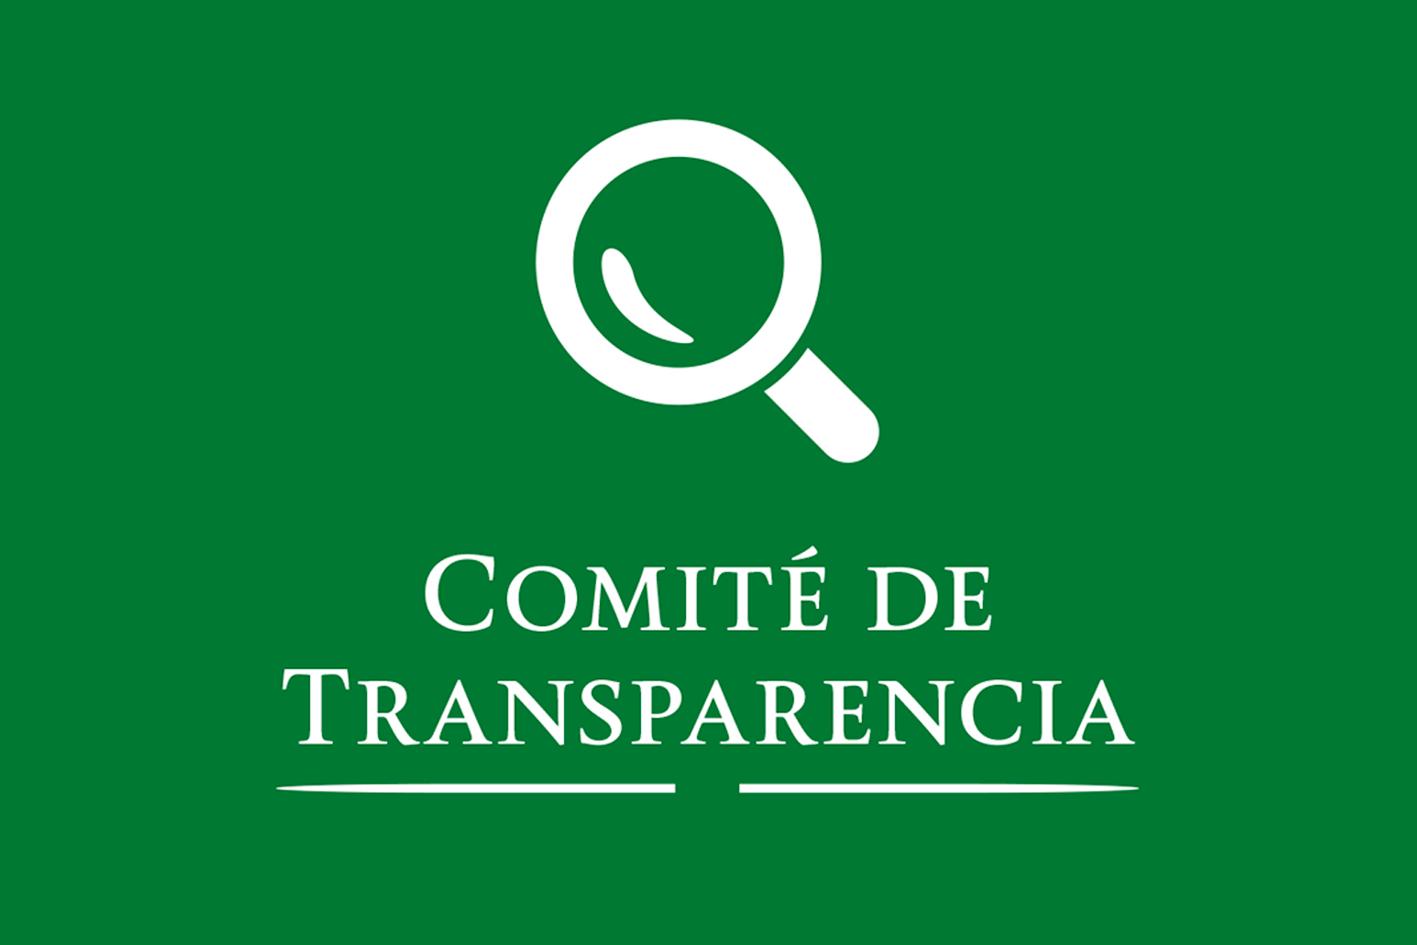 Comité de Transparencia Indaabin